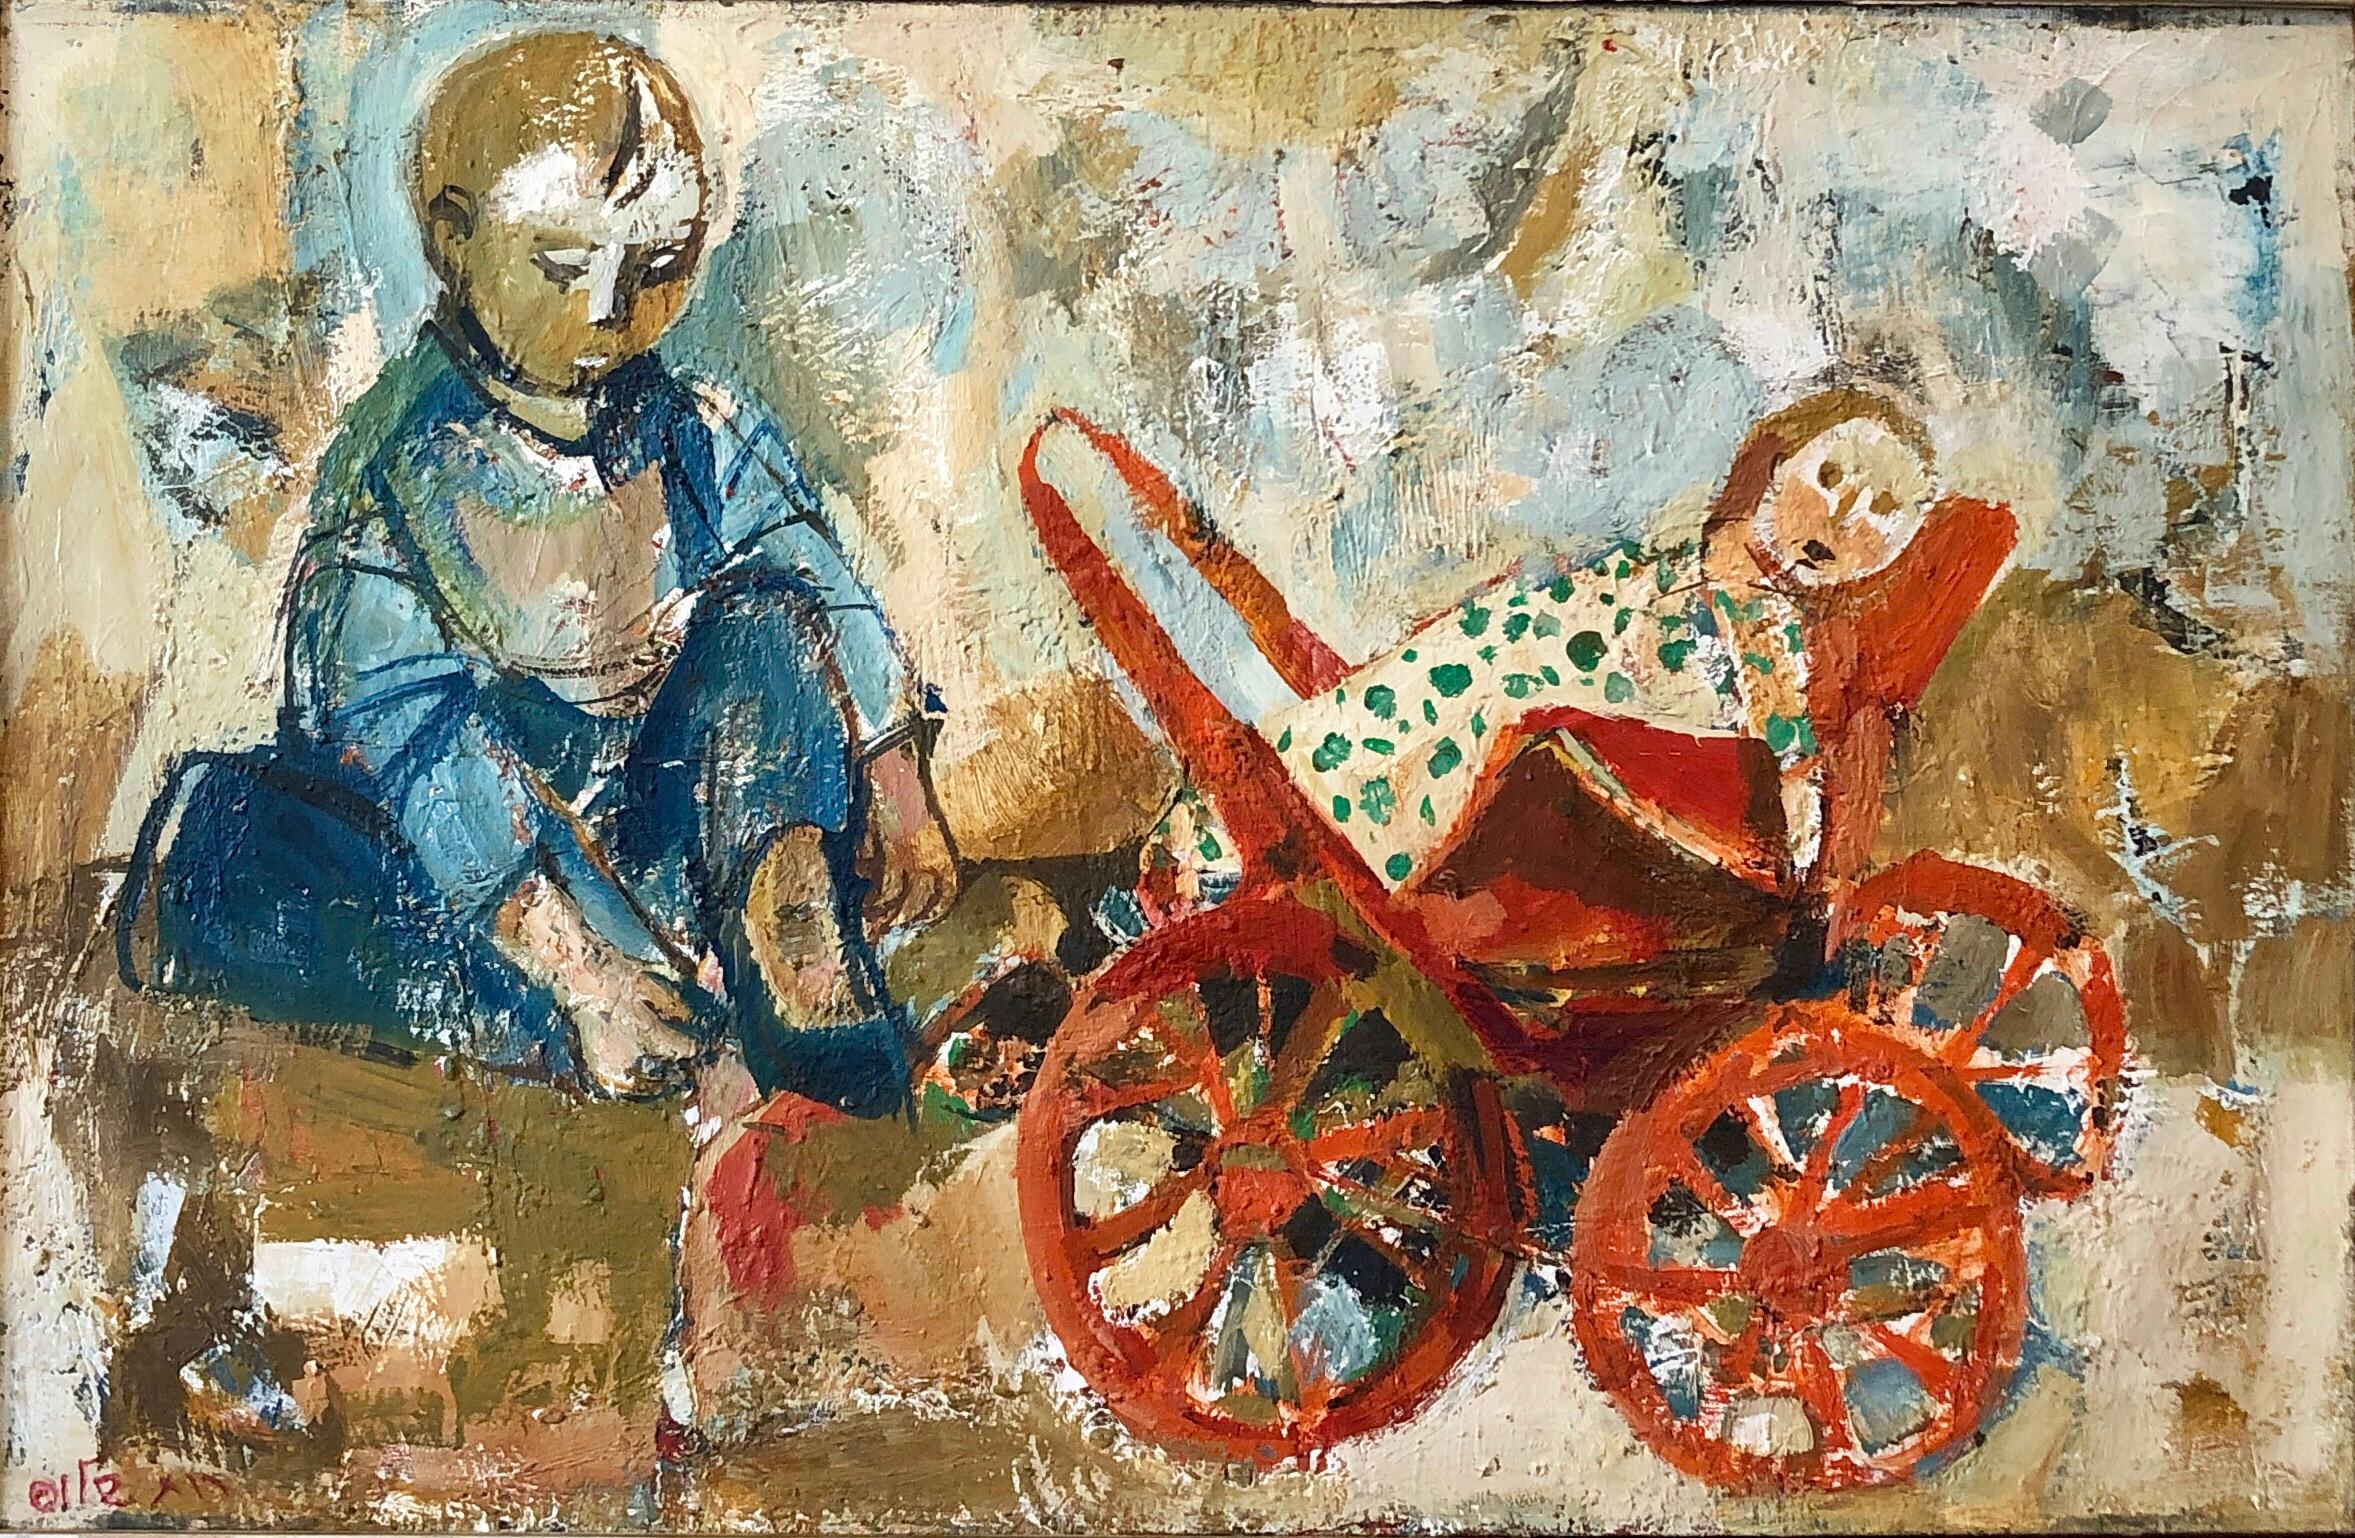 Israeli Oil Painting Ruth Schloss Child, Doll, Wagon, Kibbutz Social Realist Art